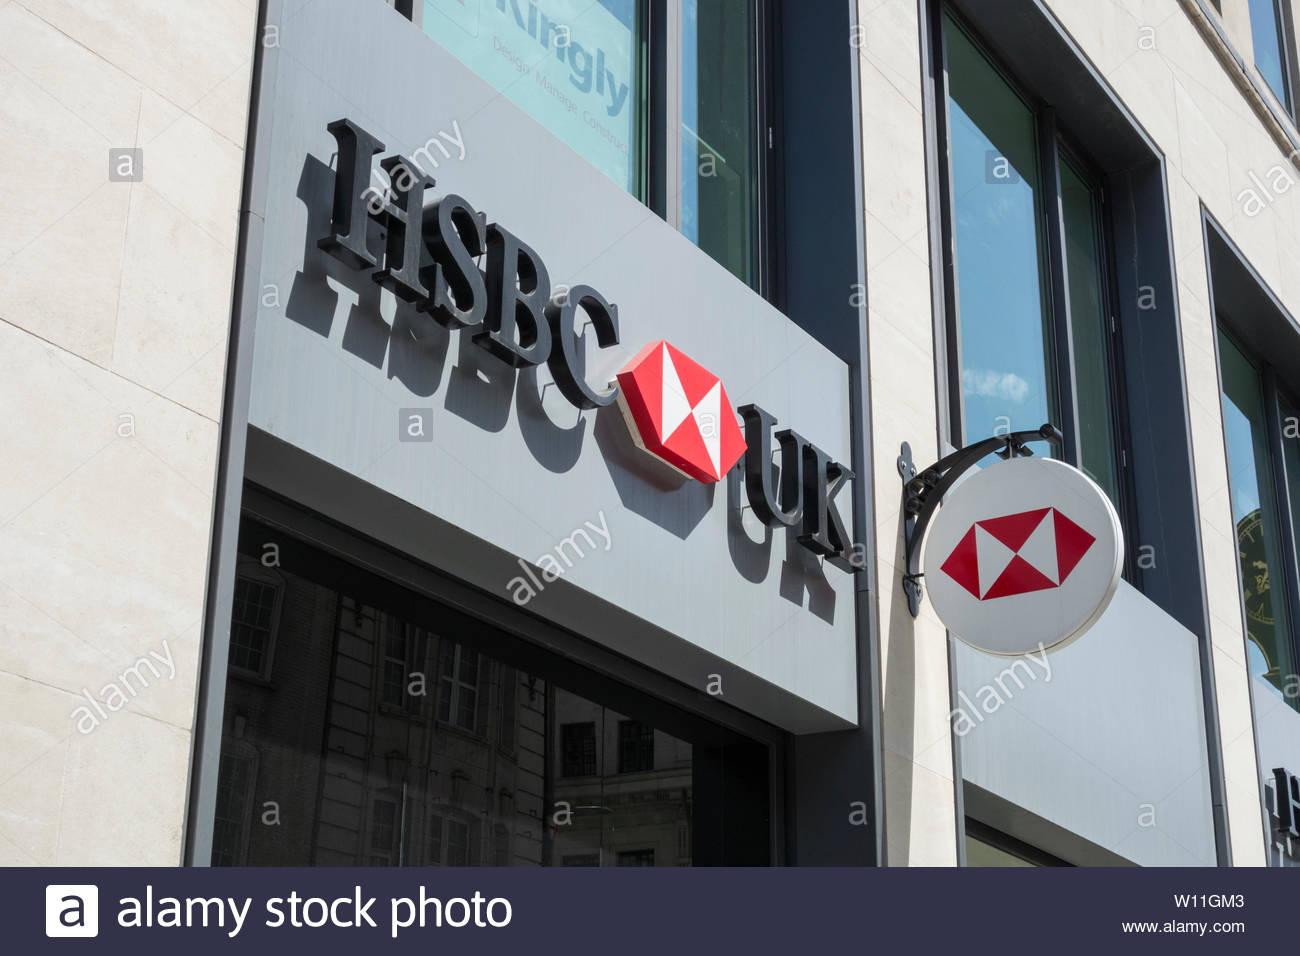 HSBC branch exterior and signage on Fleet Street, London, UK - Stock Image